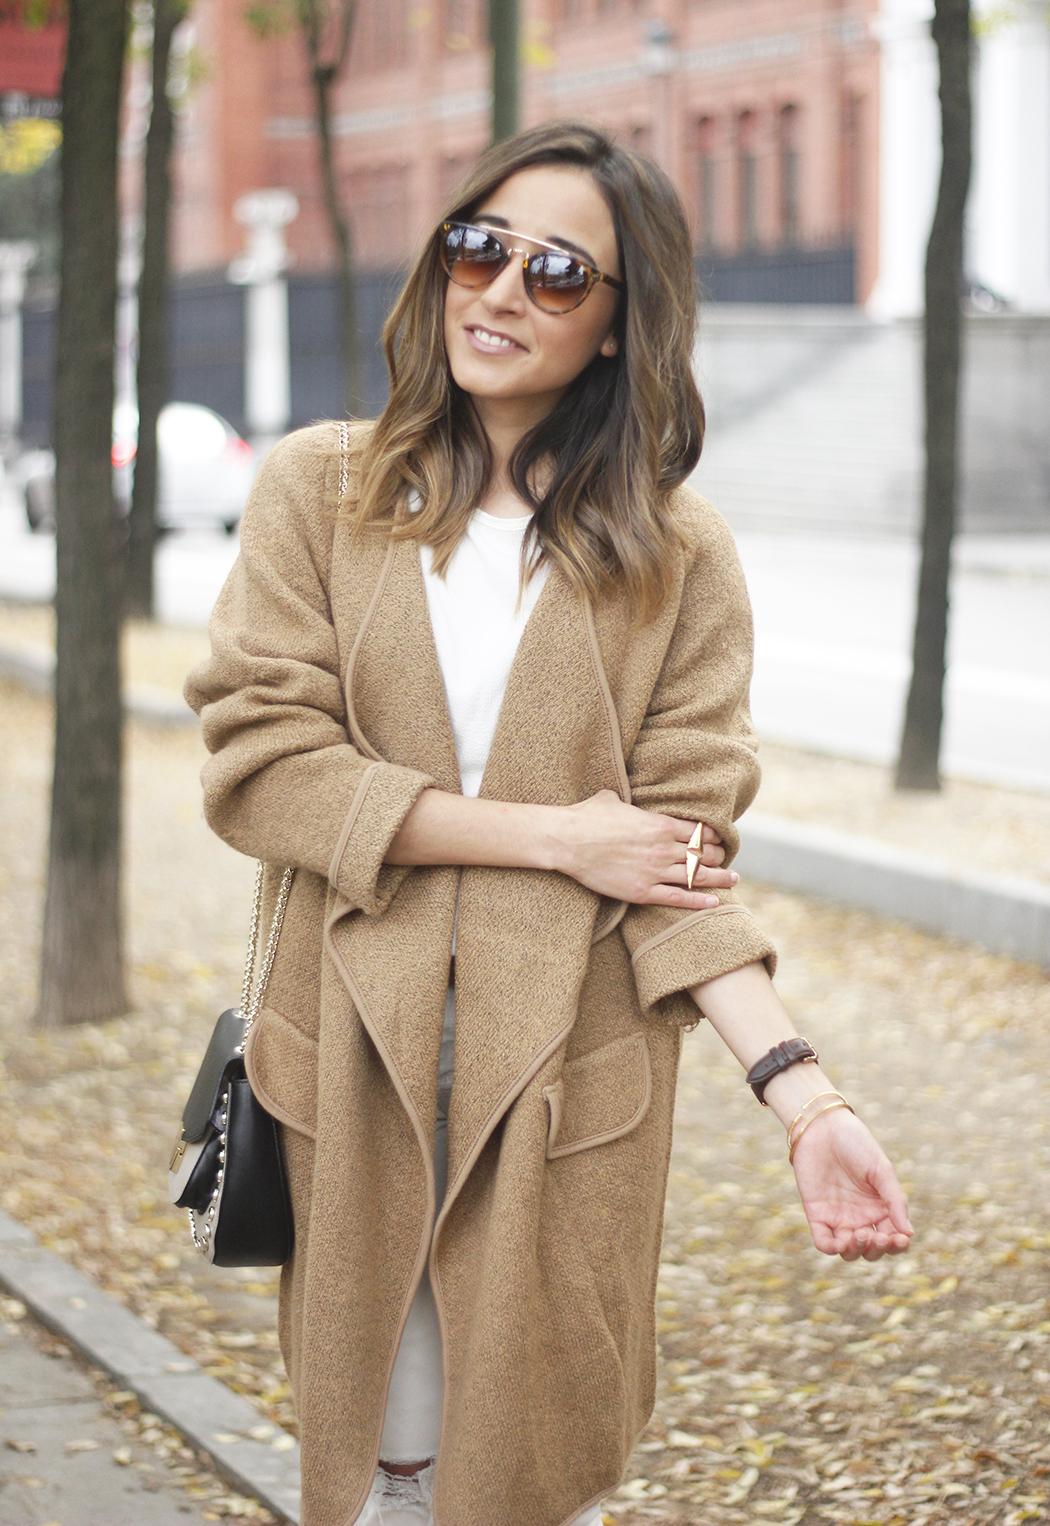 Camel Coat sheinside white outfit heels uterqüe purse outfit08